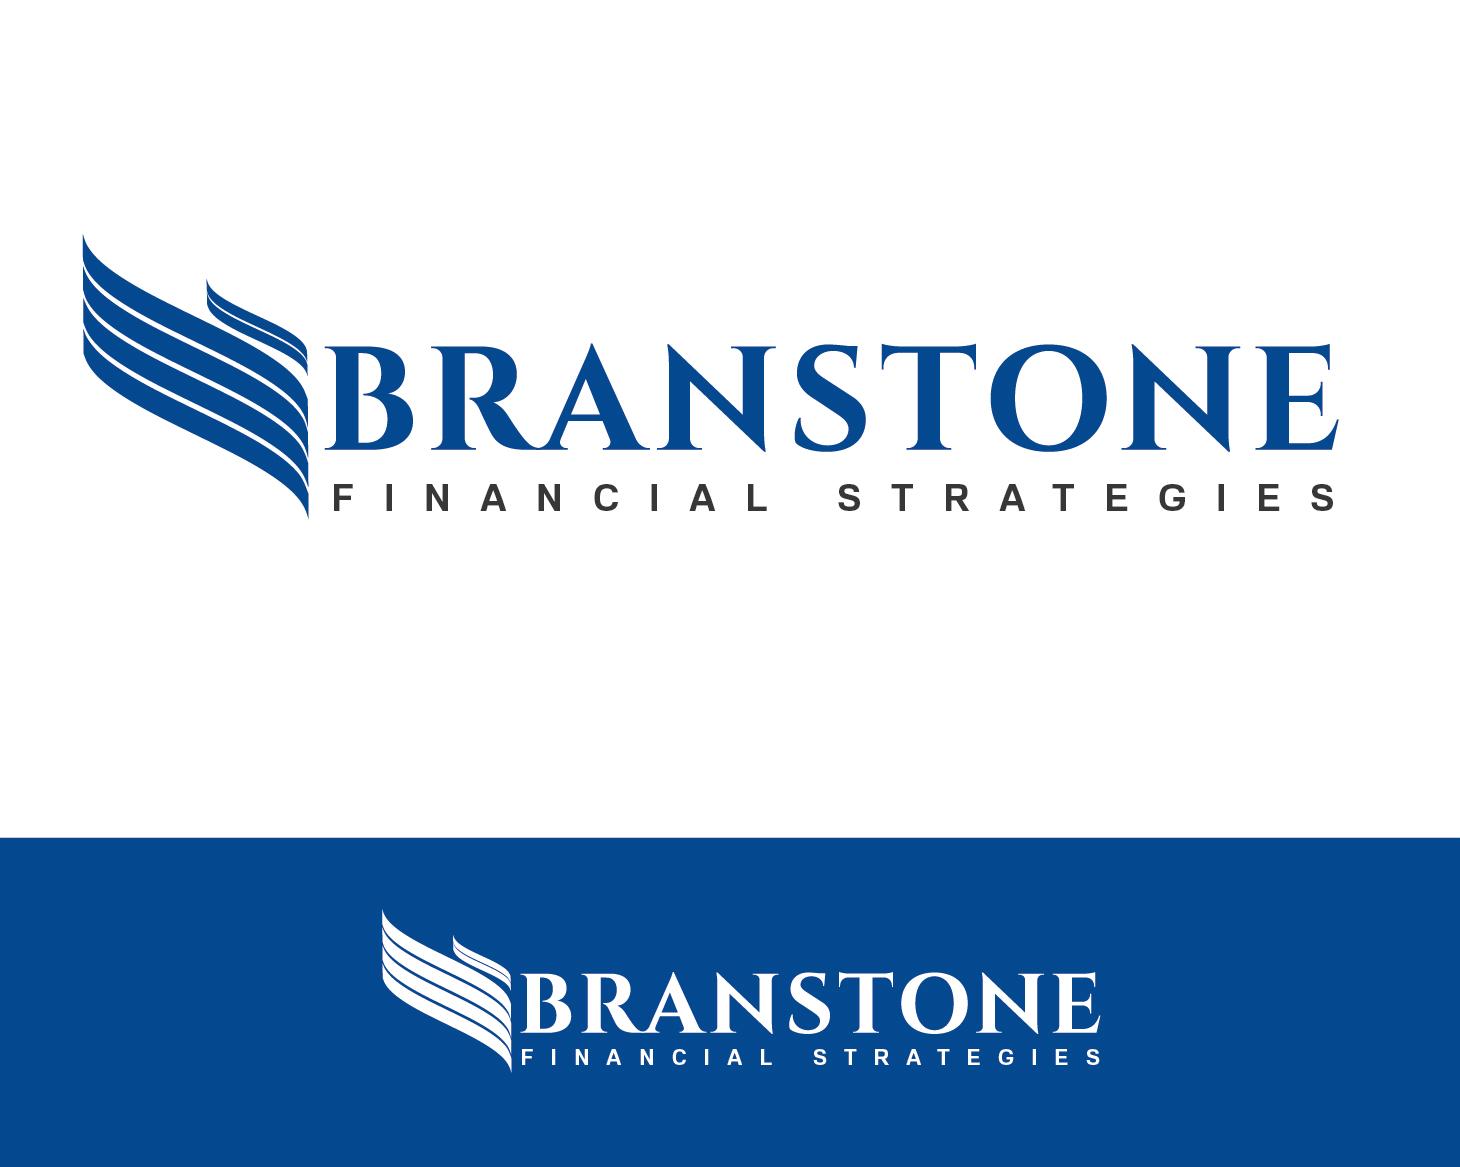 Logo Design by VENTSISLAV KOVACHEV - Entry No. 227 in the Logo Design Contest Inspiring Logo Design for Branstone Financial Strategies.